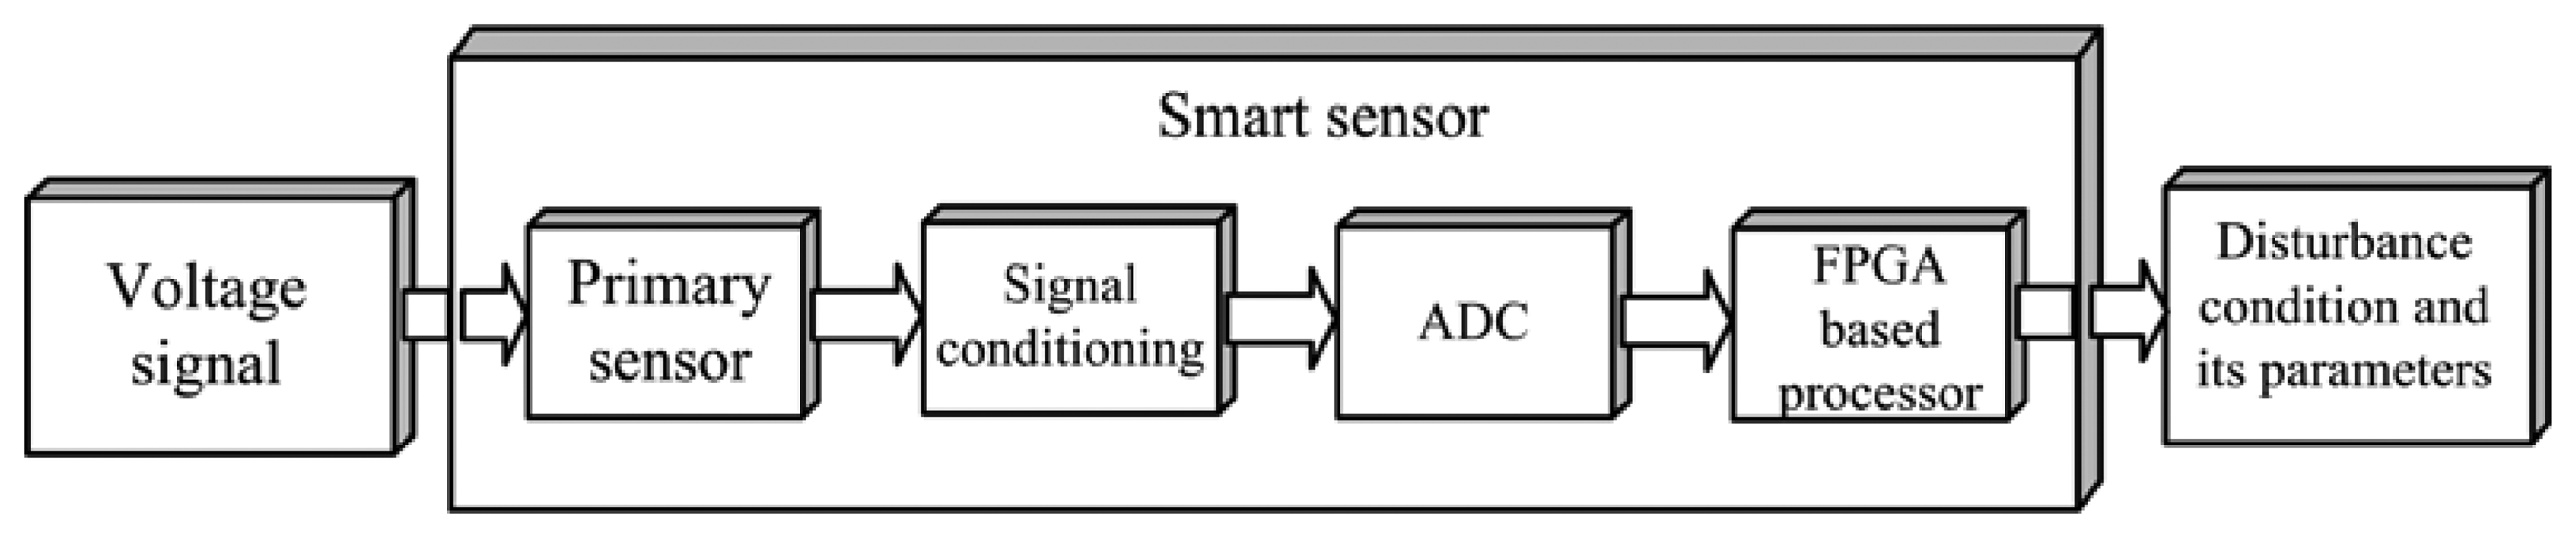 Sensors | Free Full-Text | A Hilbert Transform-Based Smart Sensor ...